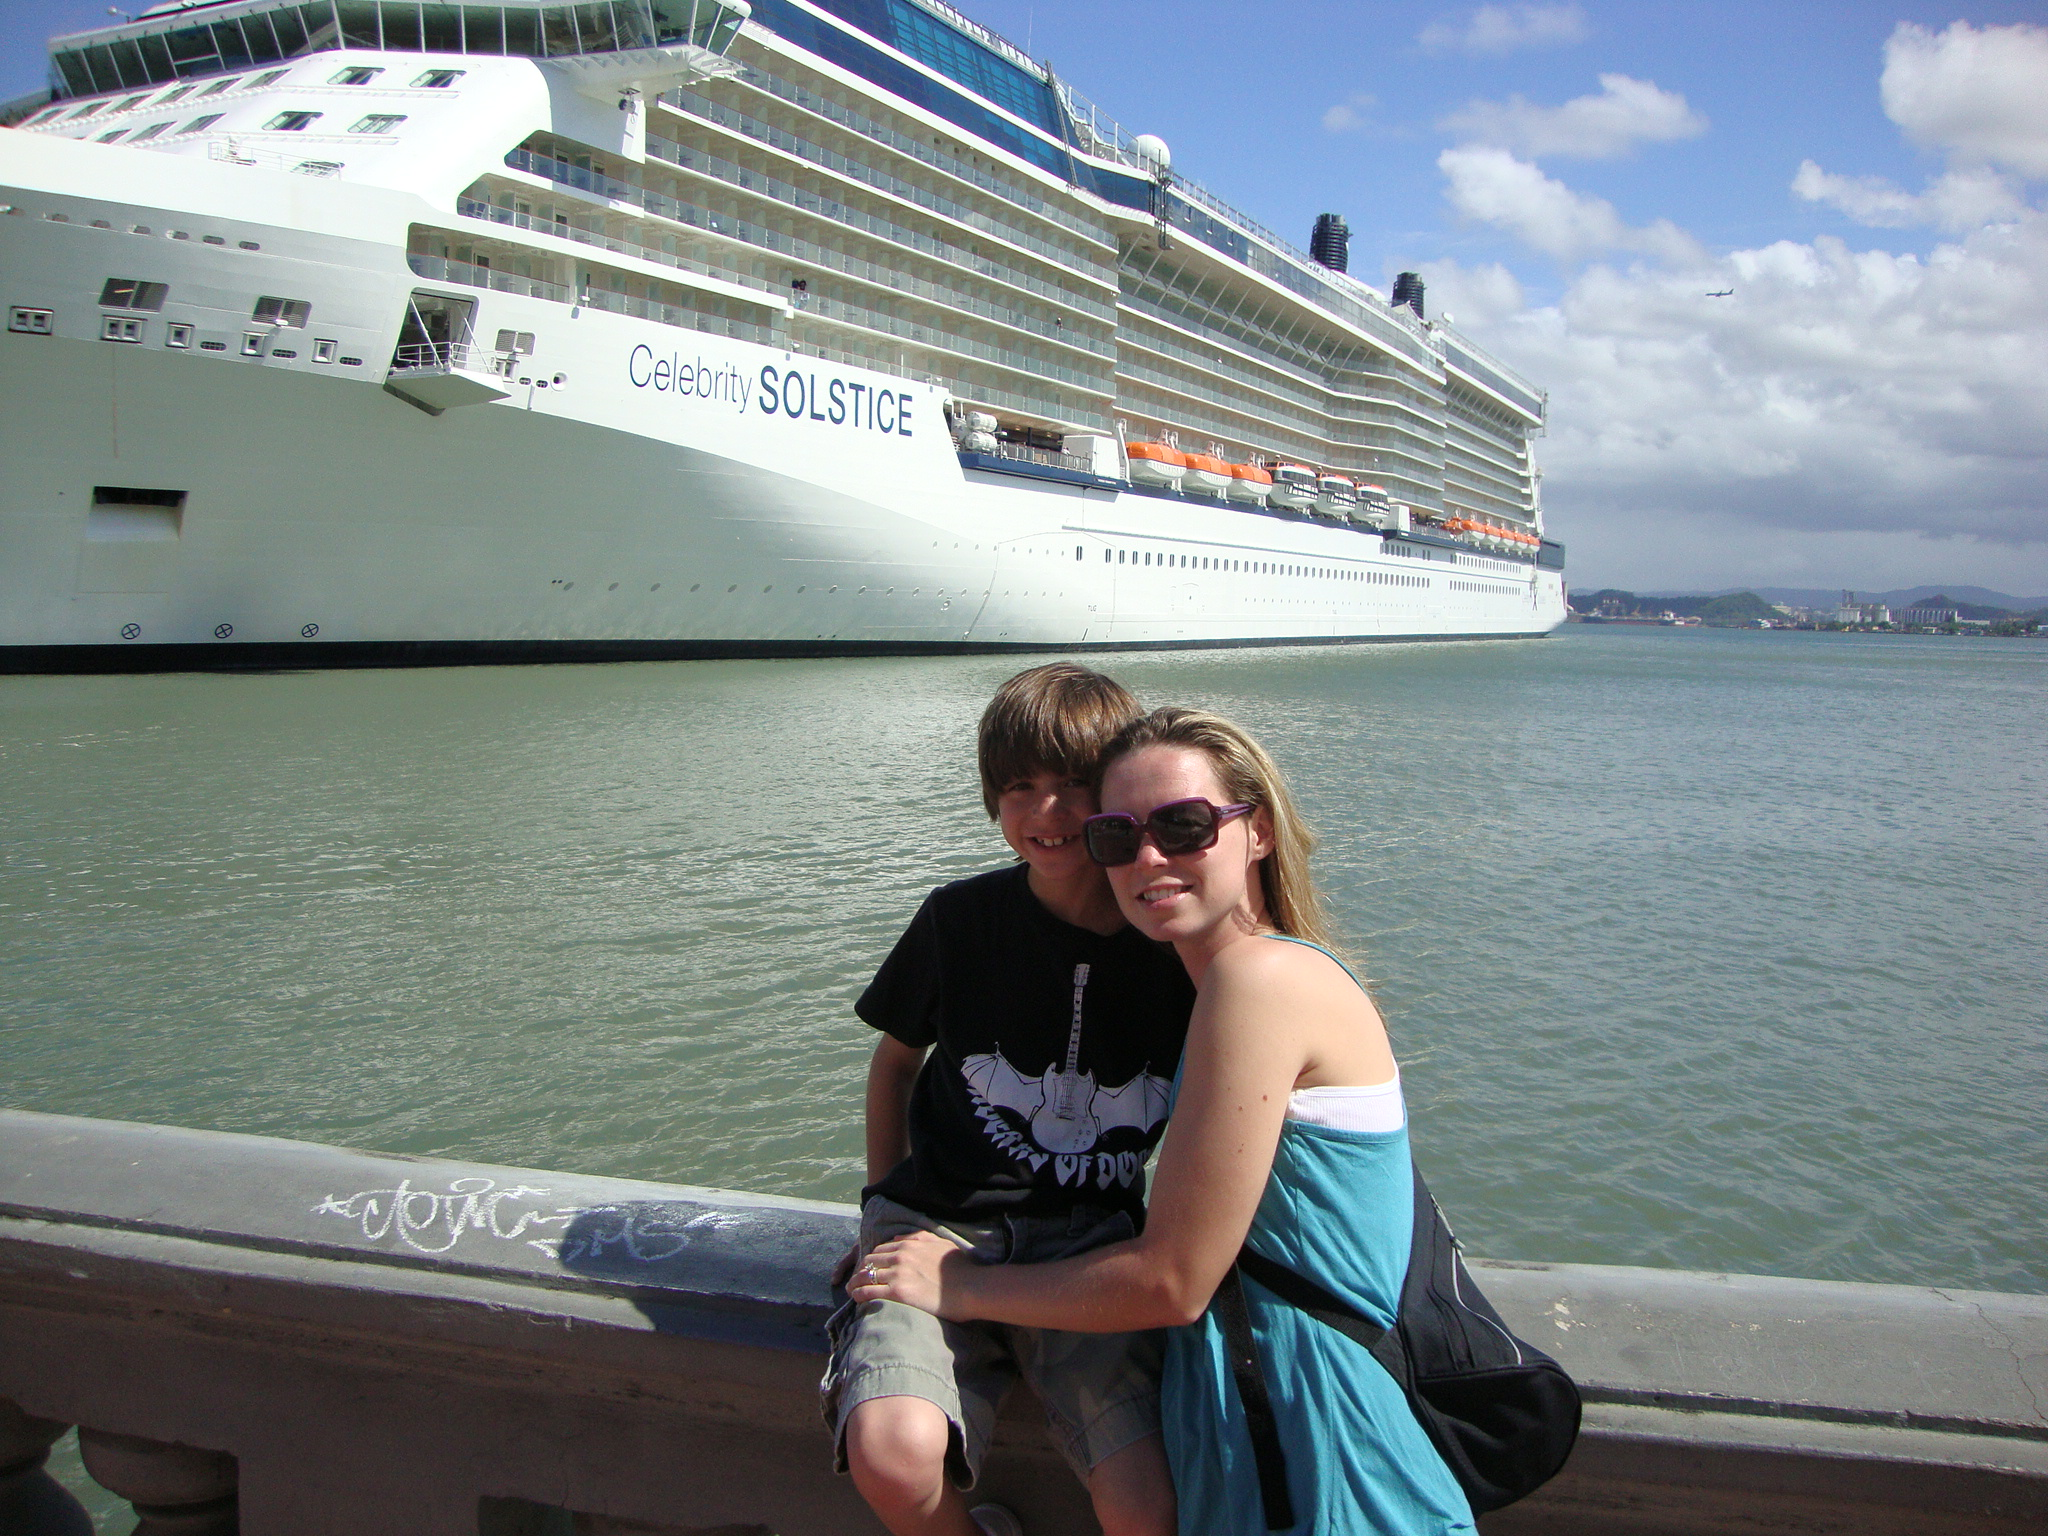 Celebrity Solstice Cruise Ship: Review, Photos & Departure ...